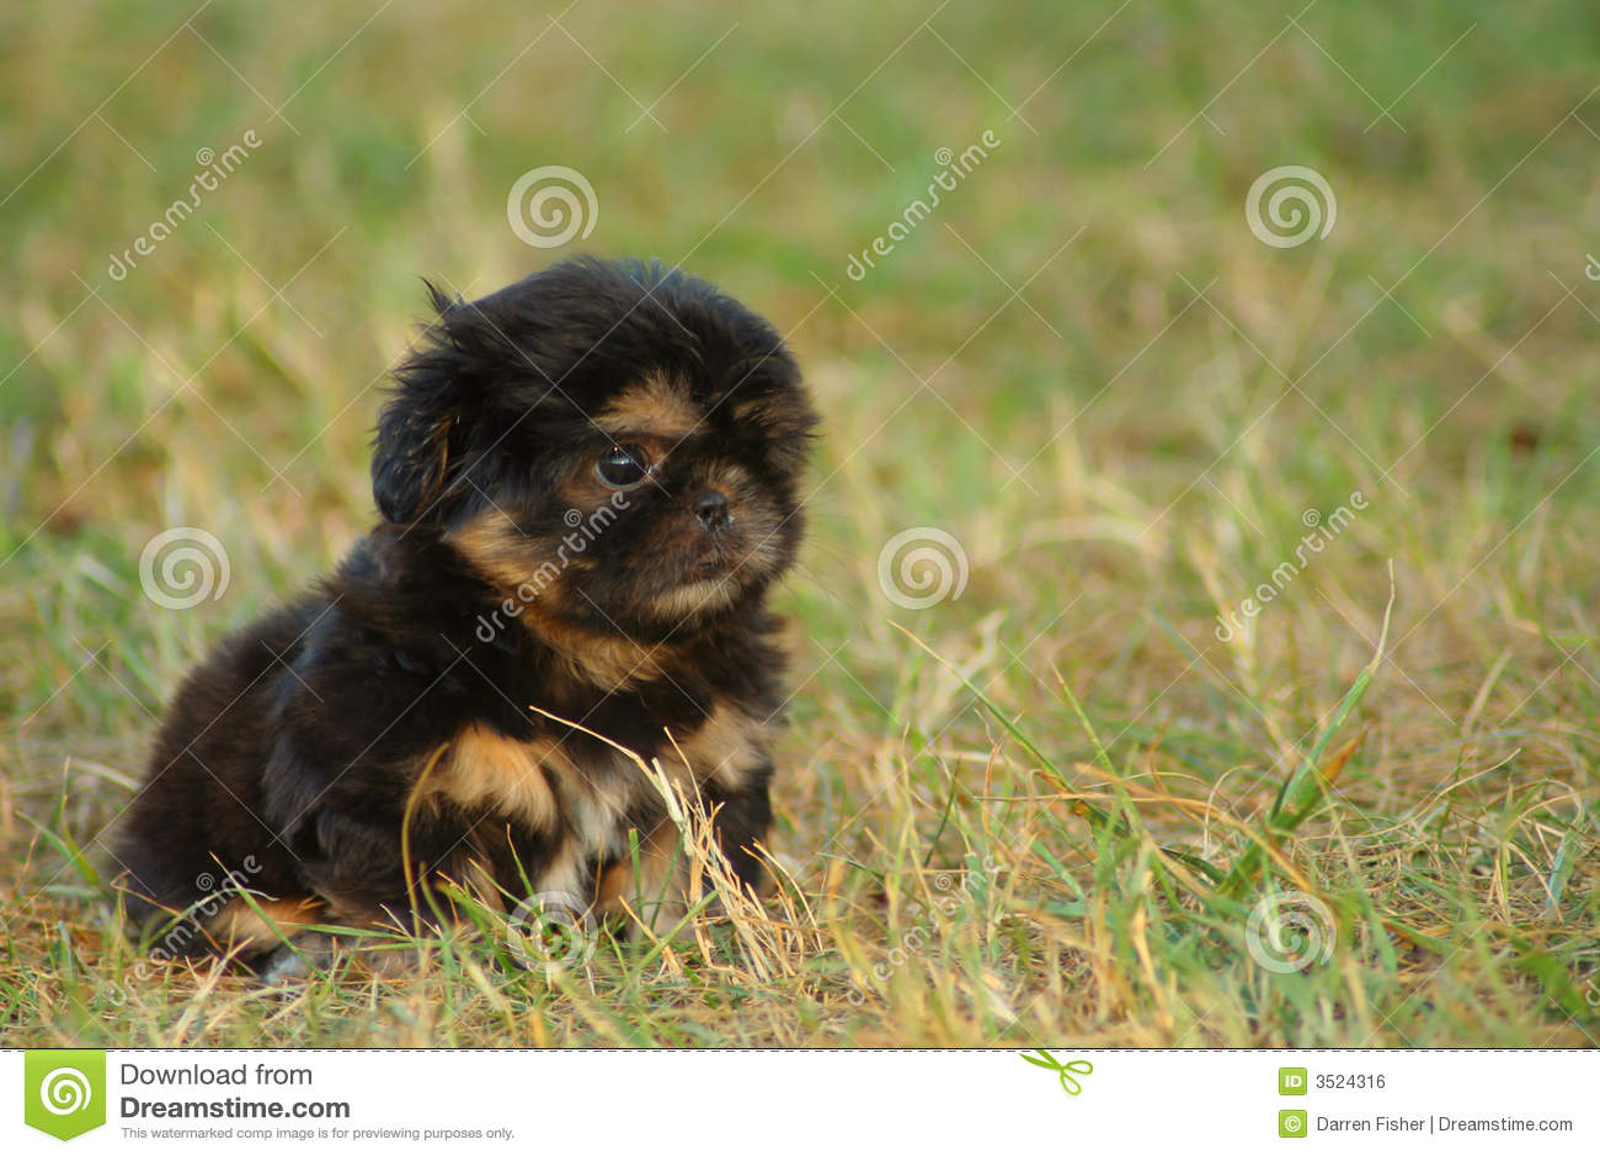 Shih Tzu Puppy Royalty Free Stock Image - Image: 3524316